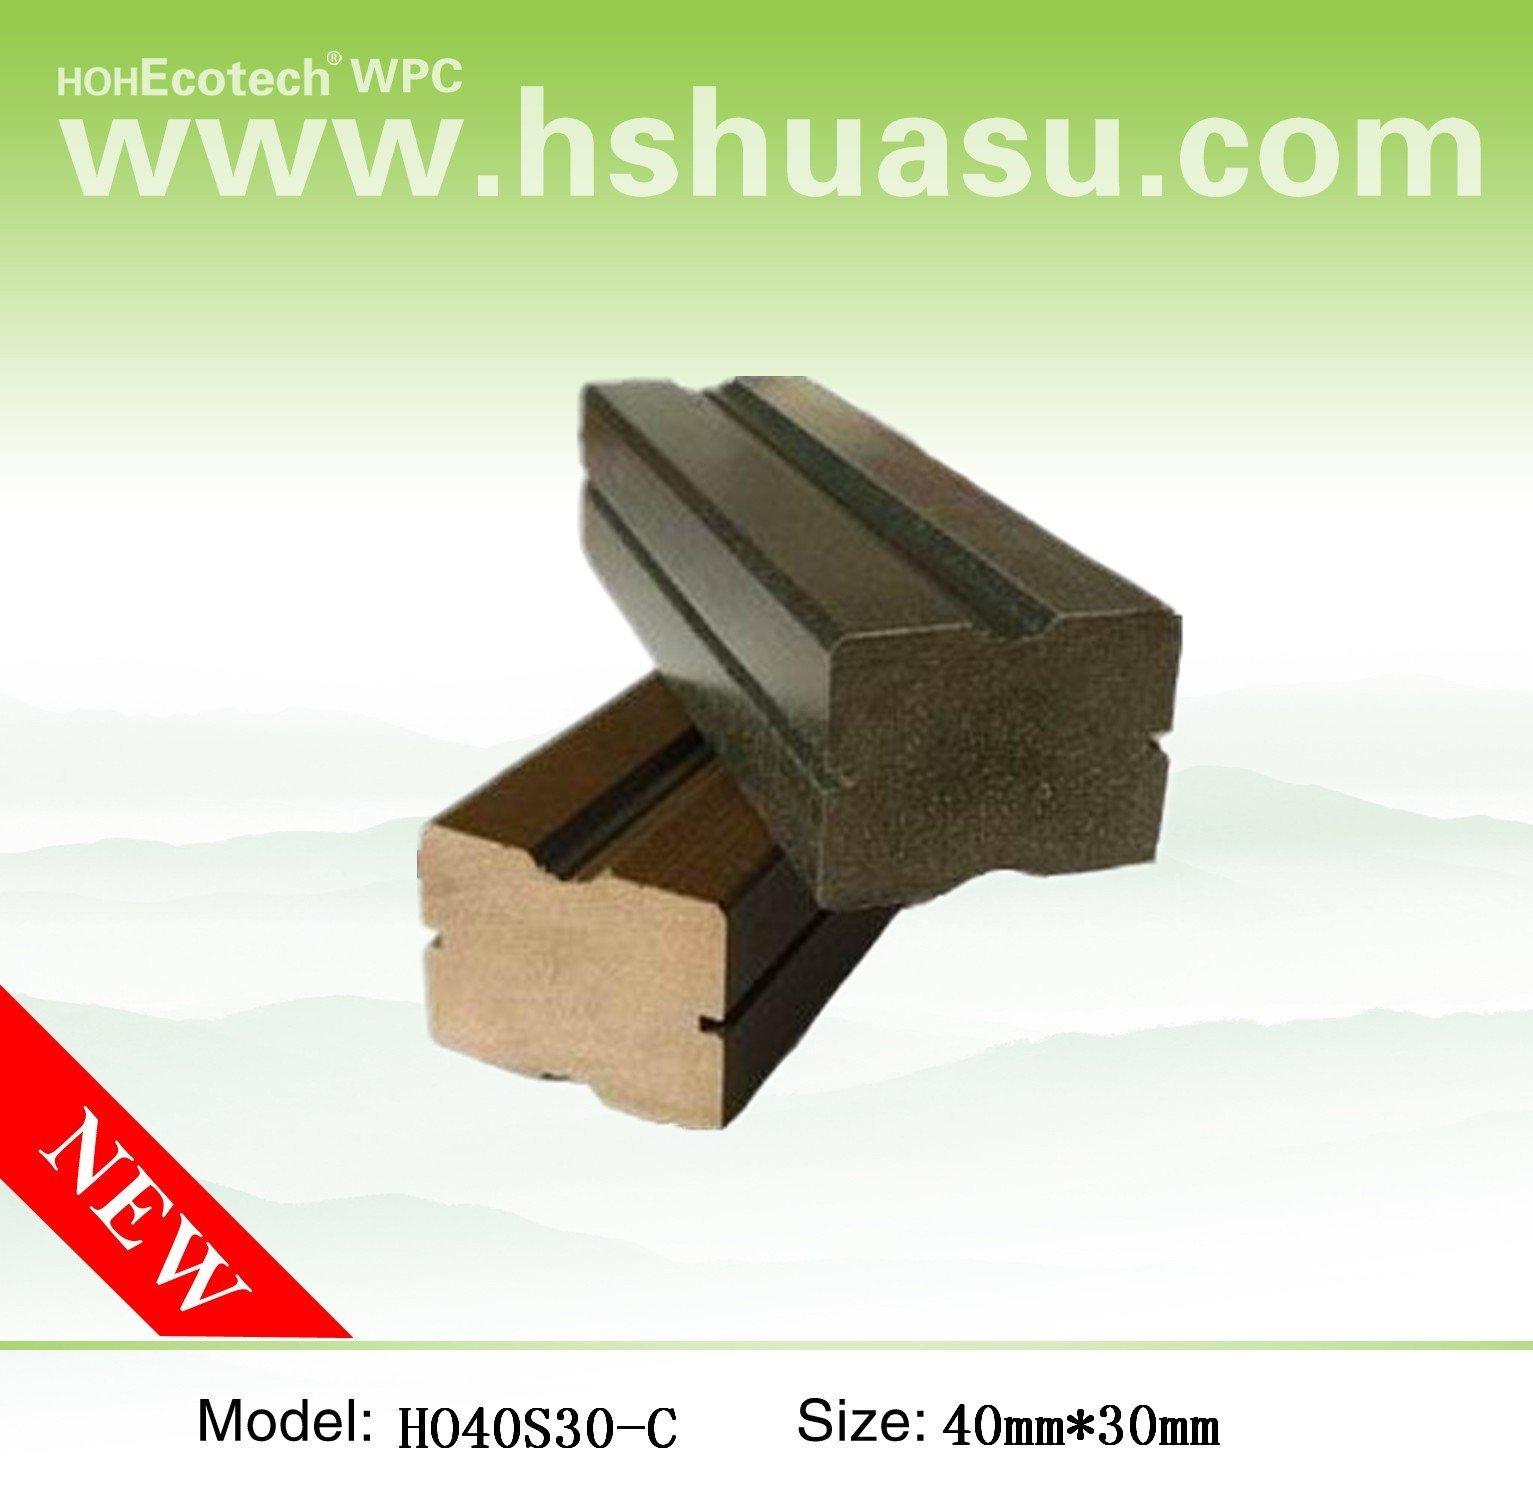 Hd40s30-c твердых joist_